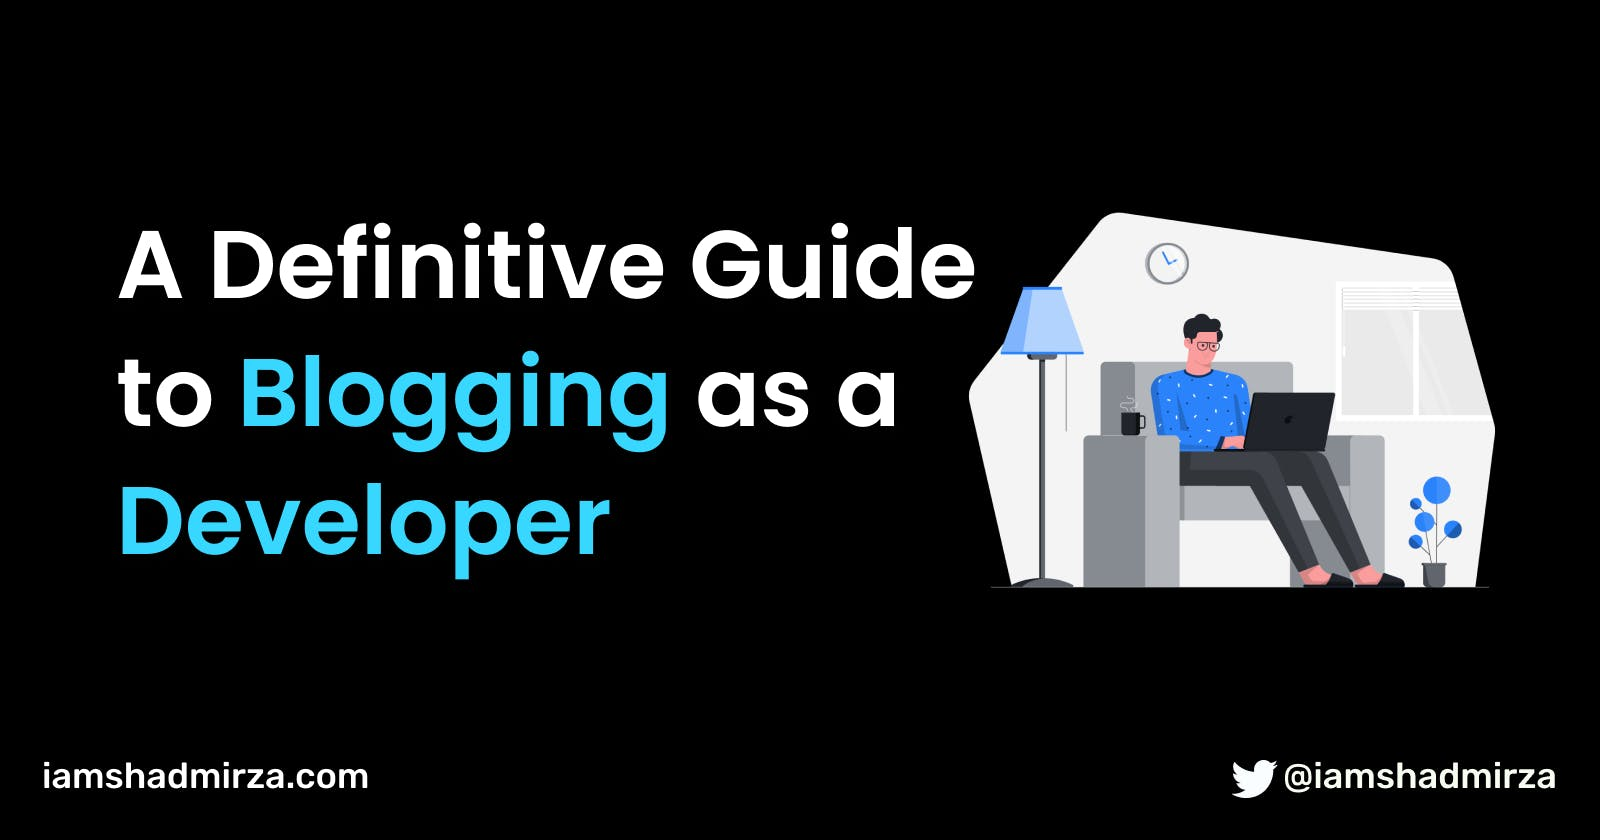 A Definitive Guide to Blogging as a Developer